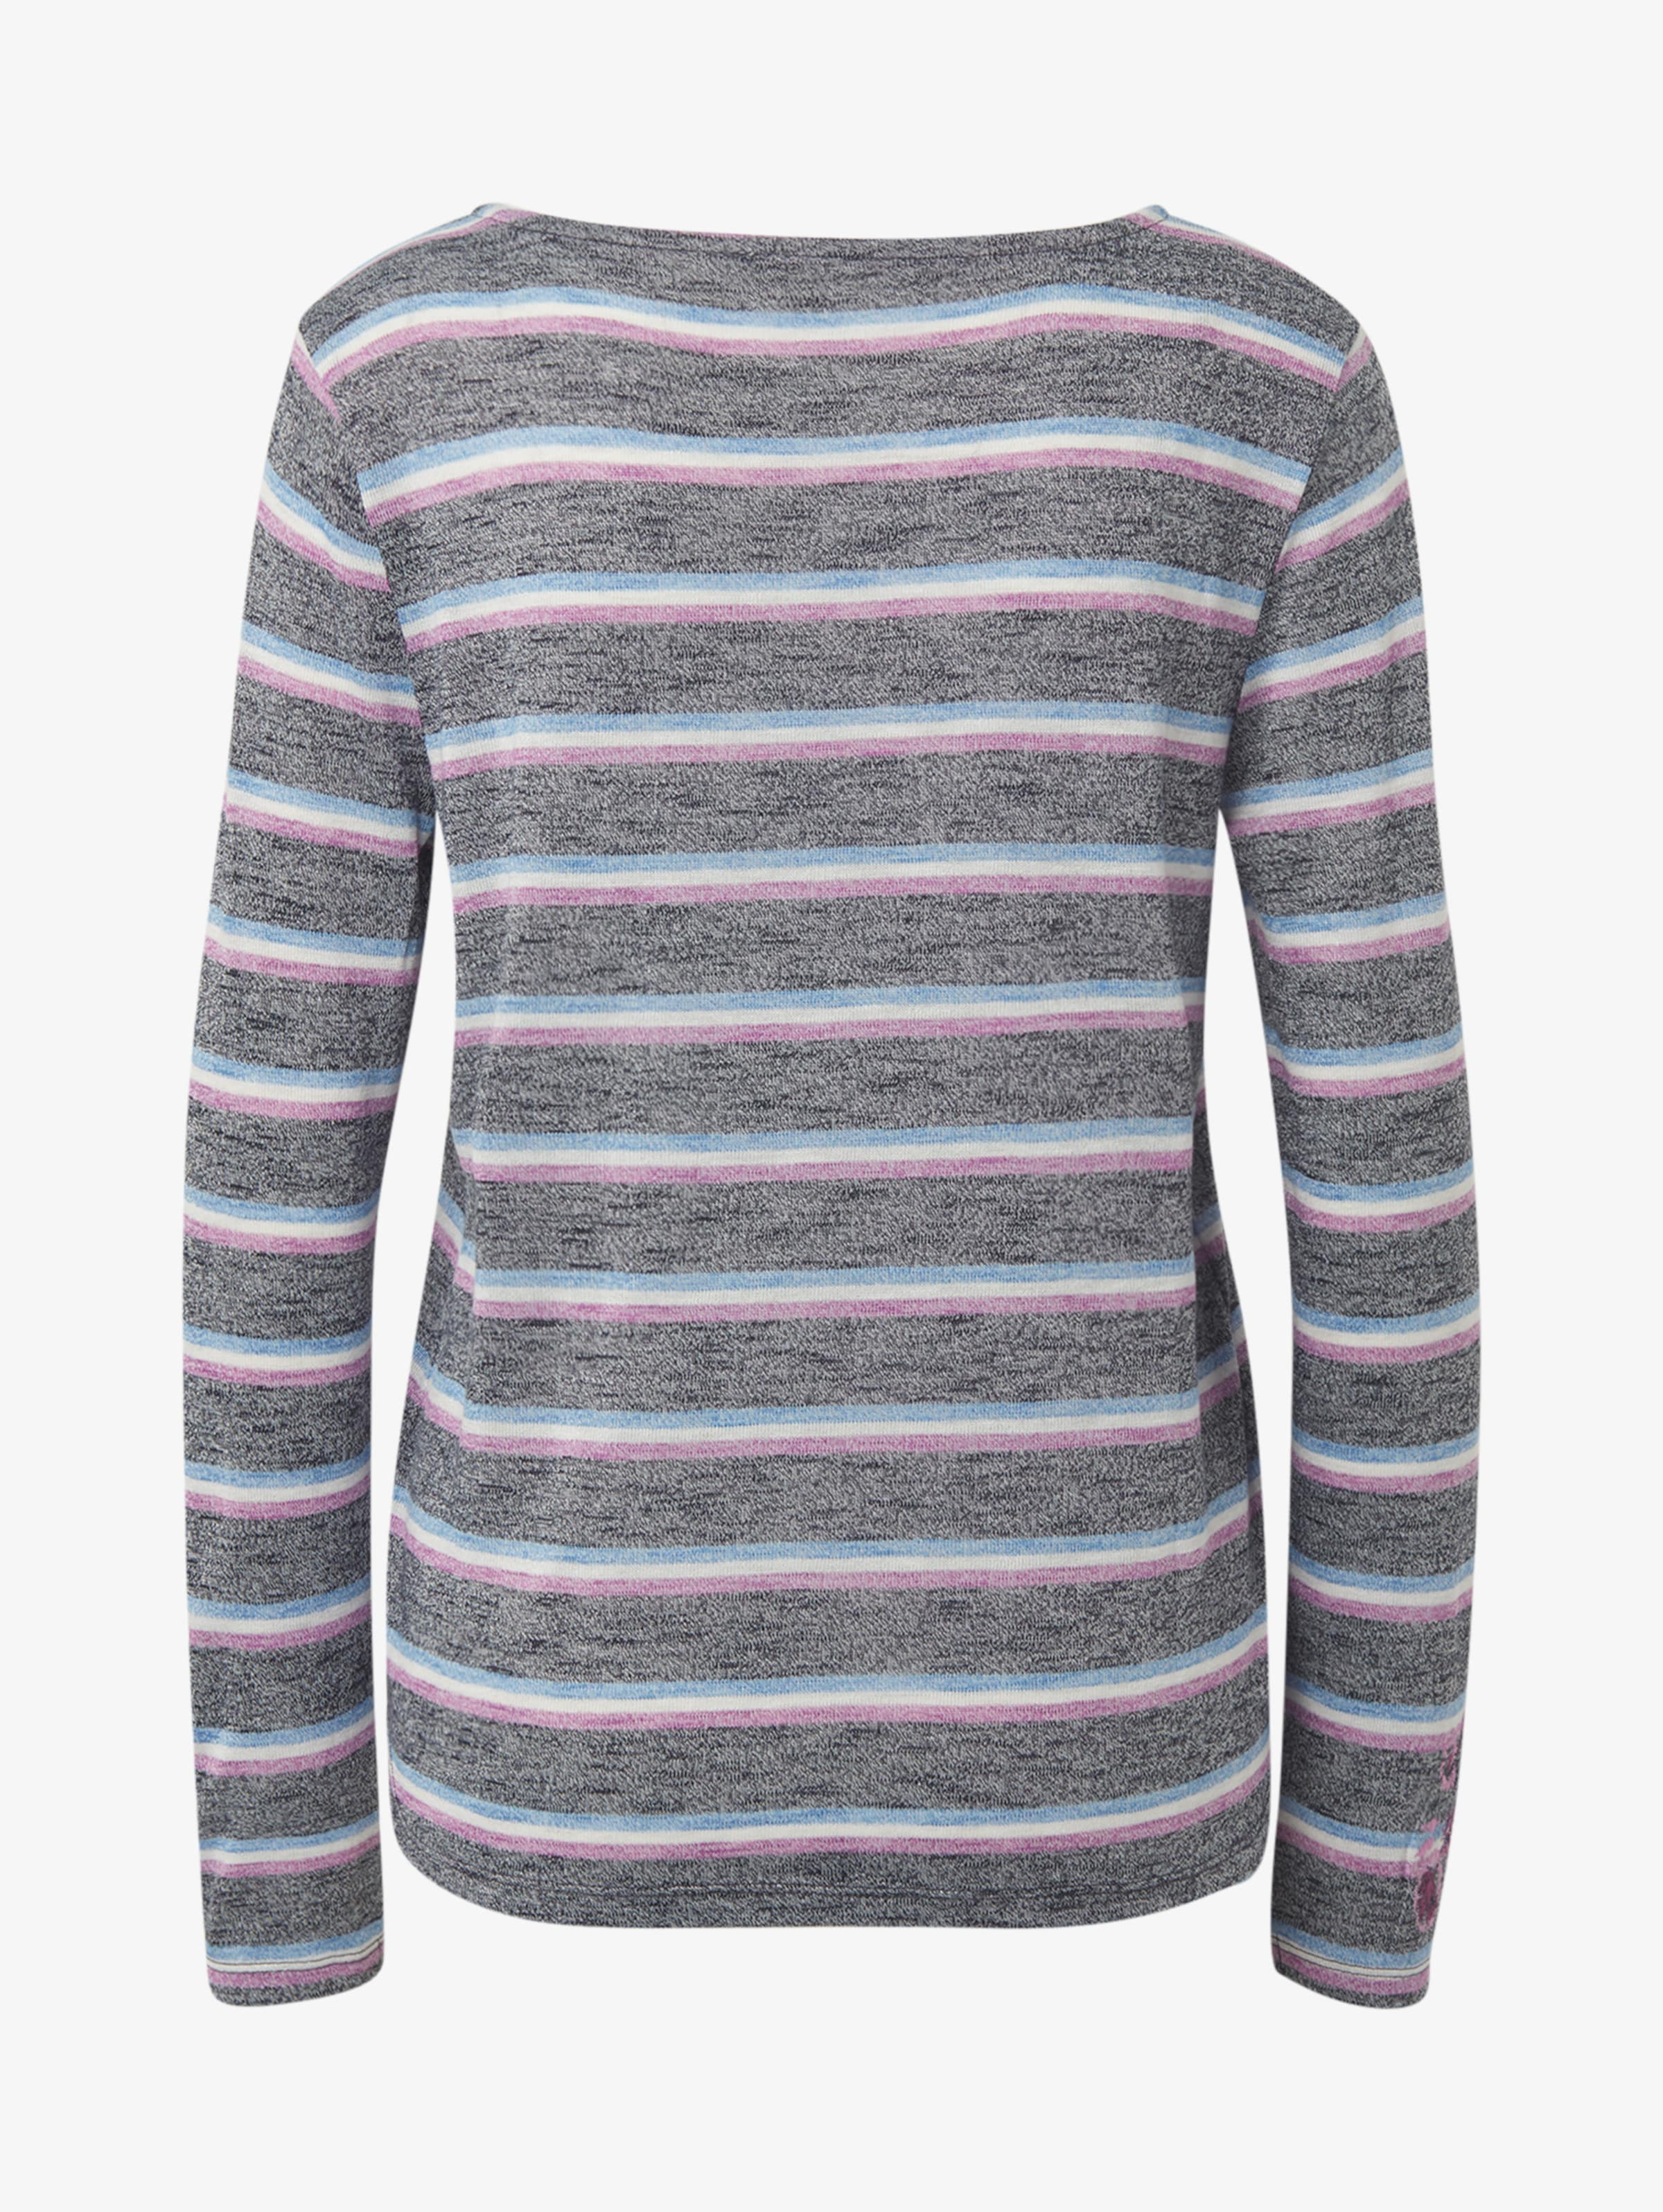 HellblauGraumeliert In Lila Weiß Tom Shirt Tailor DI9HYWE2